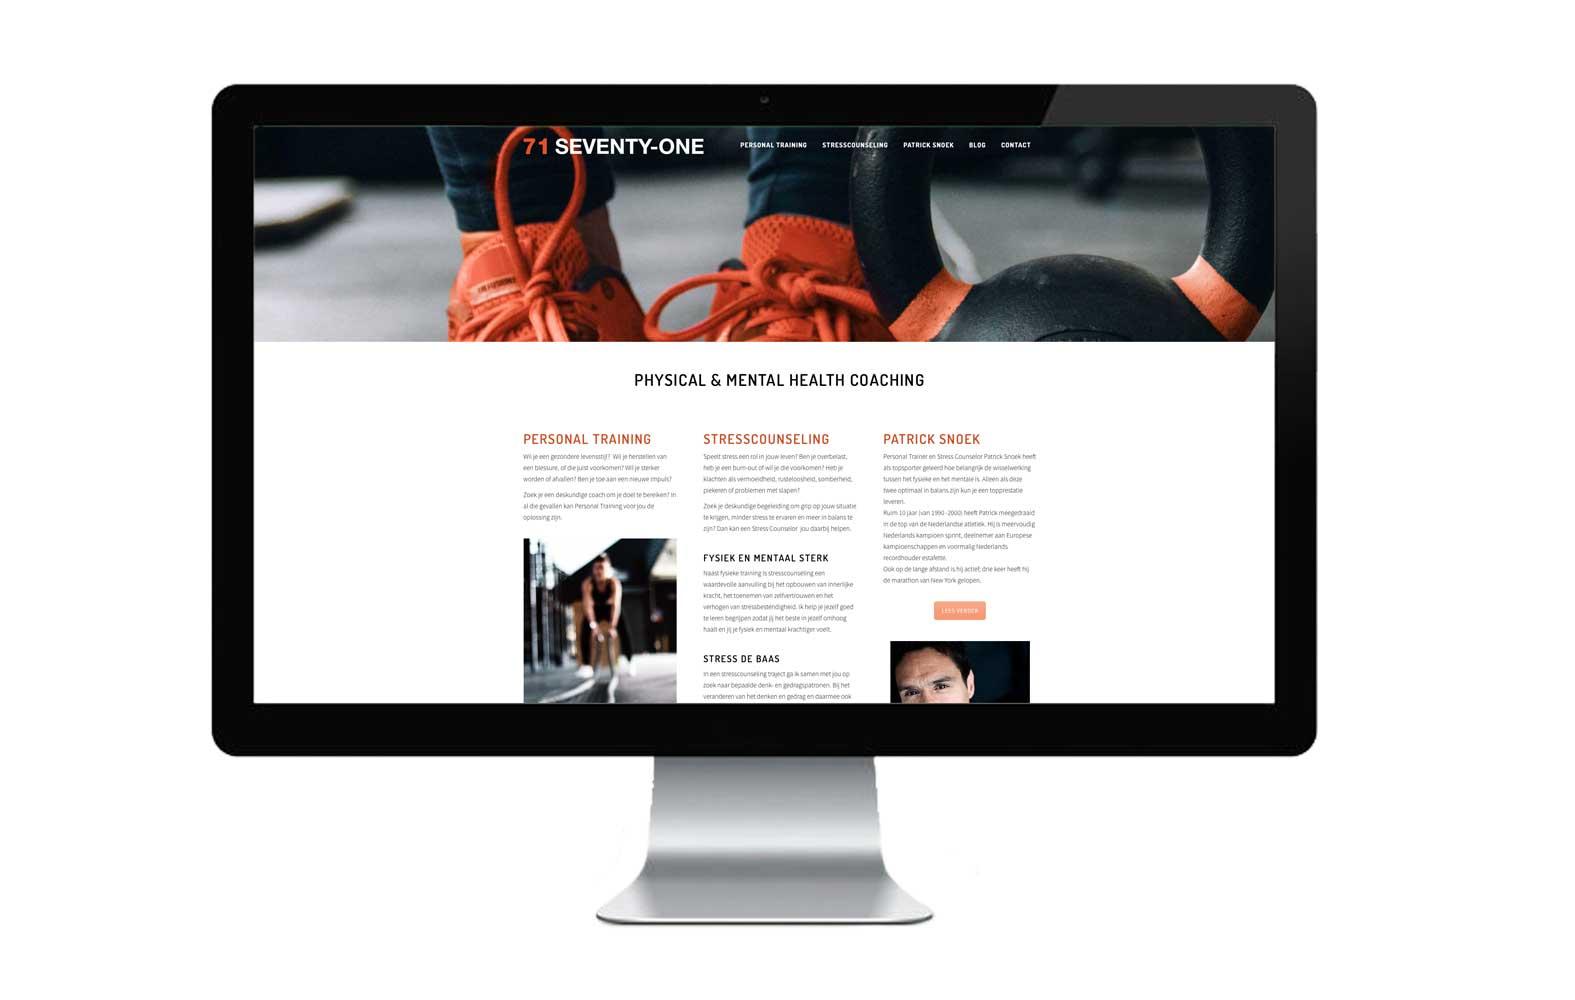 StudioErnst-WebDesign-SeventyOne1